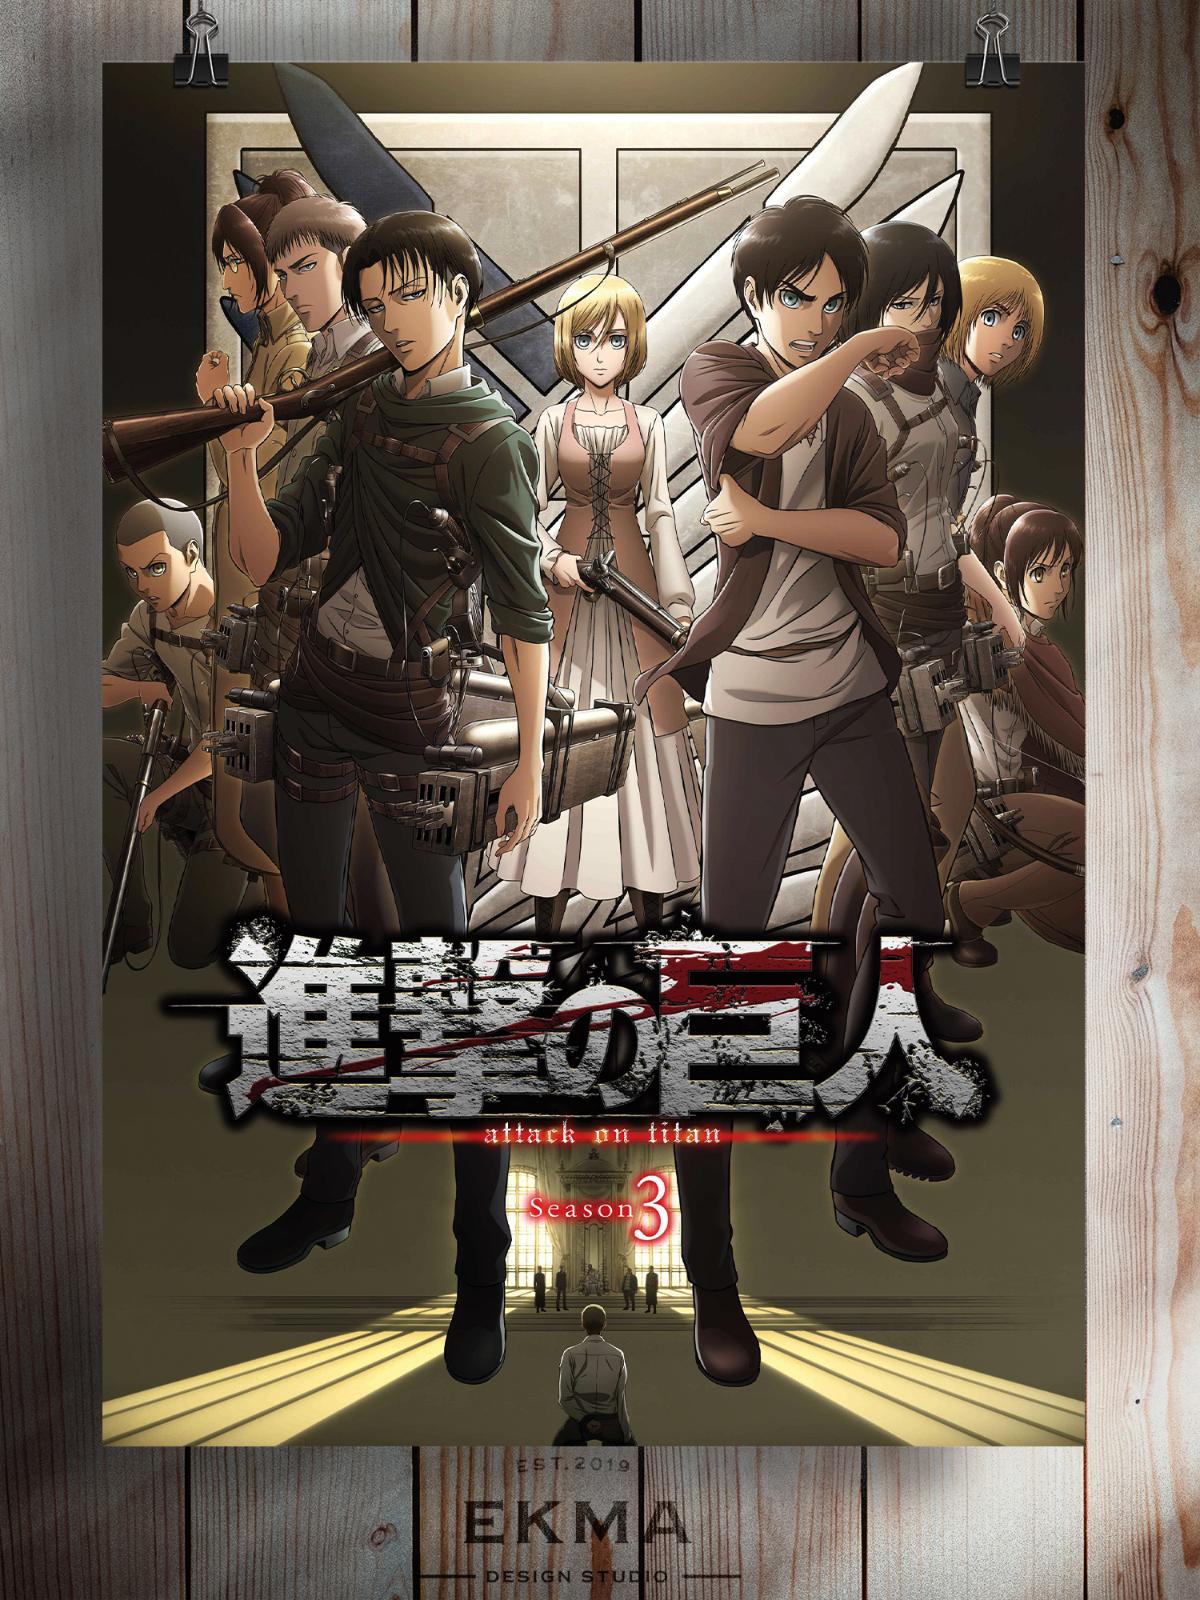 Attack on Titan Season 3 Anime Manga Poster Art Print A3 ...